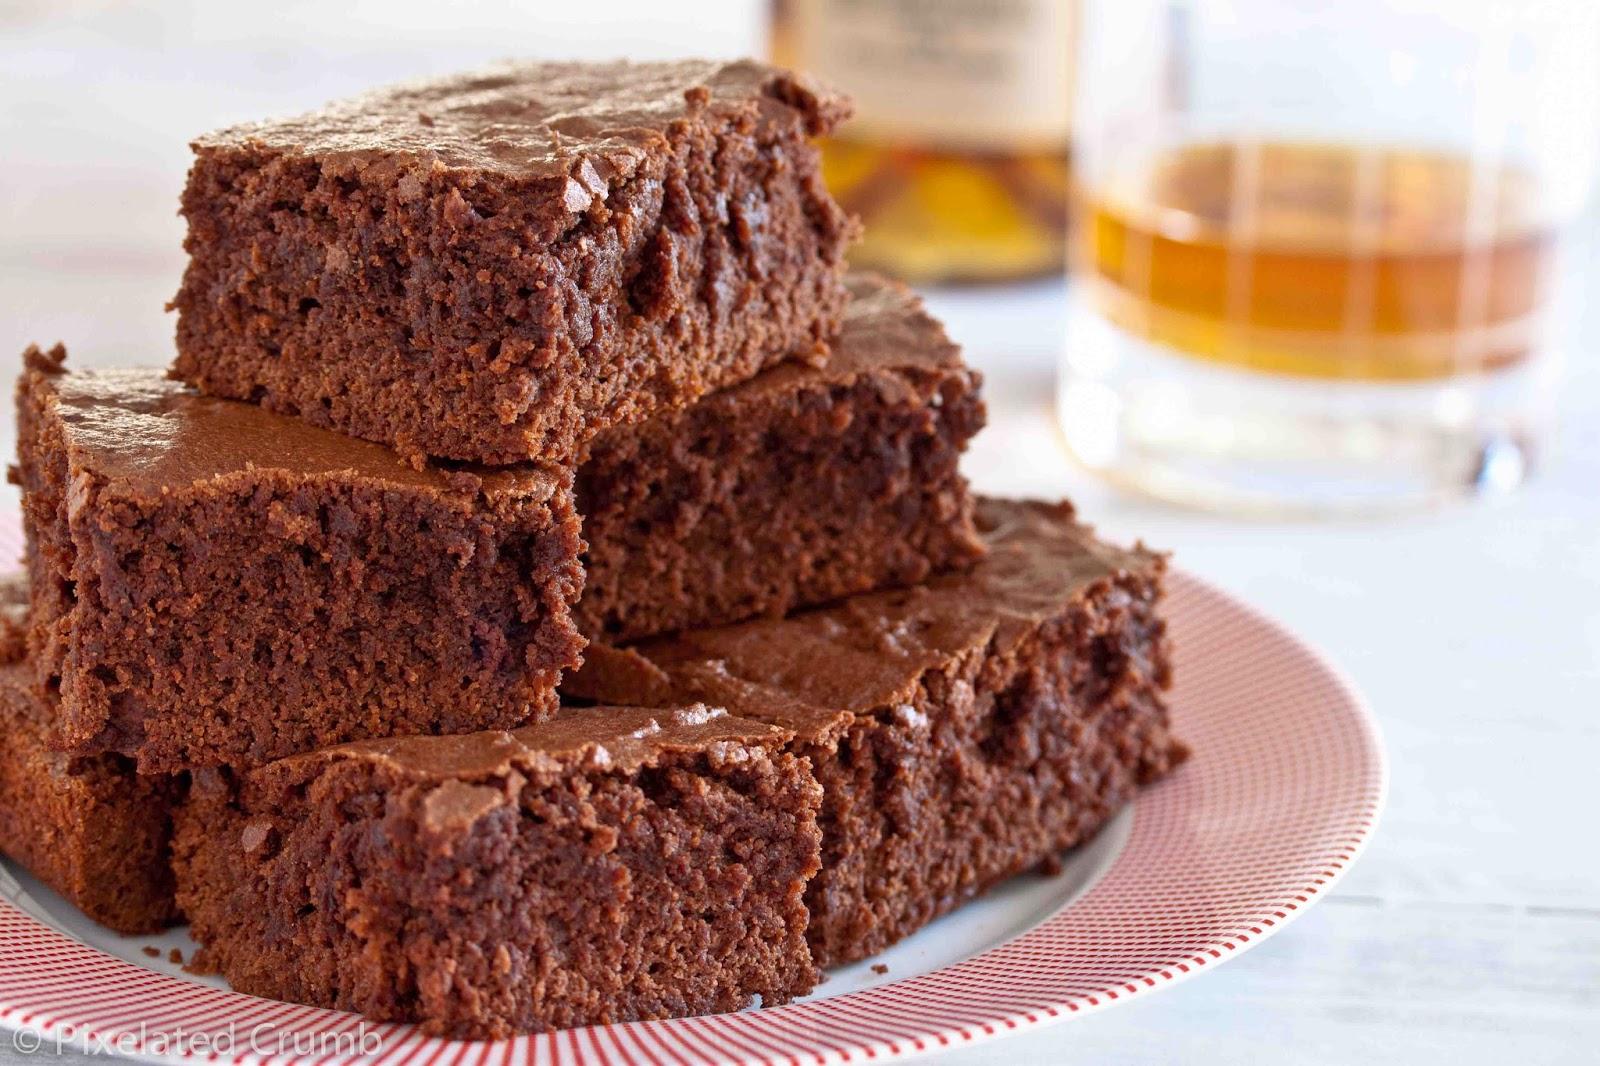 Recette des Brownies